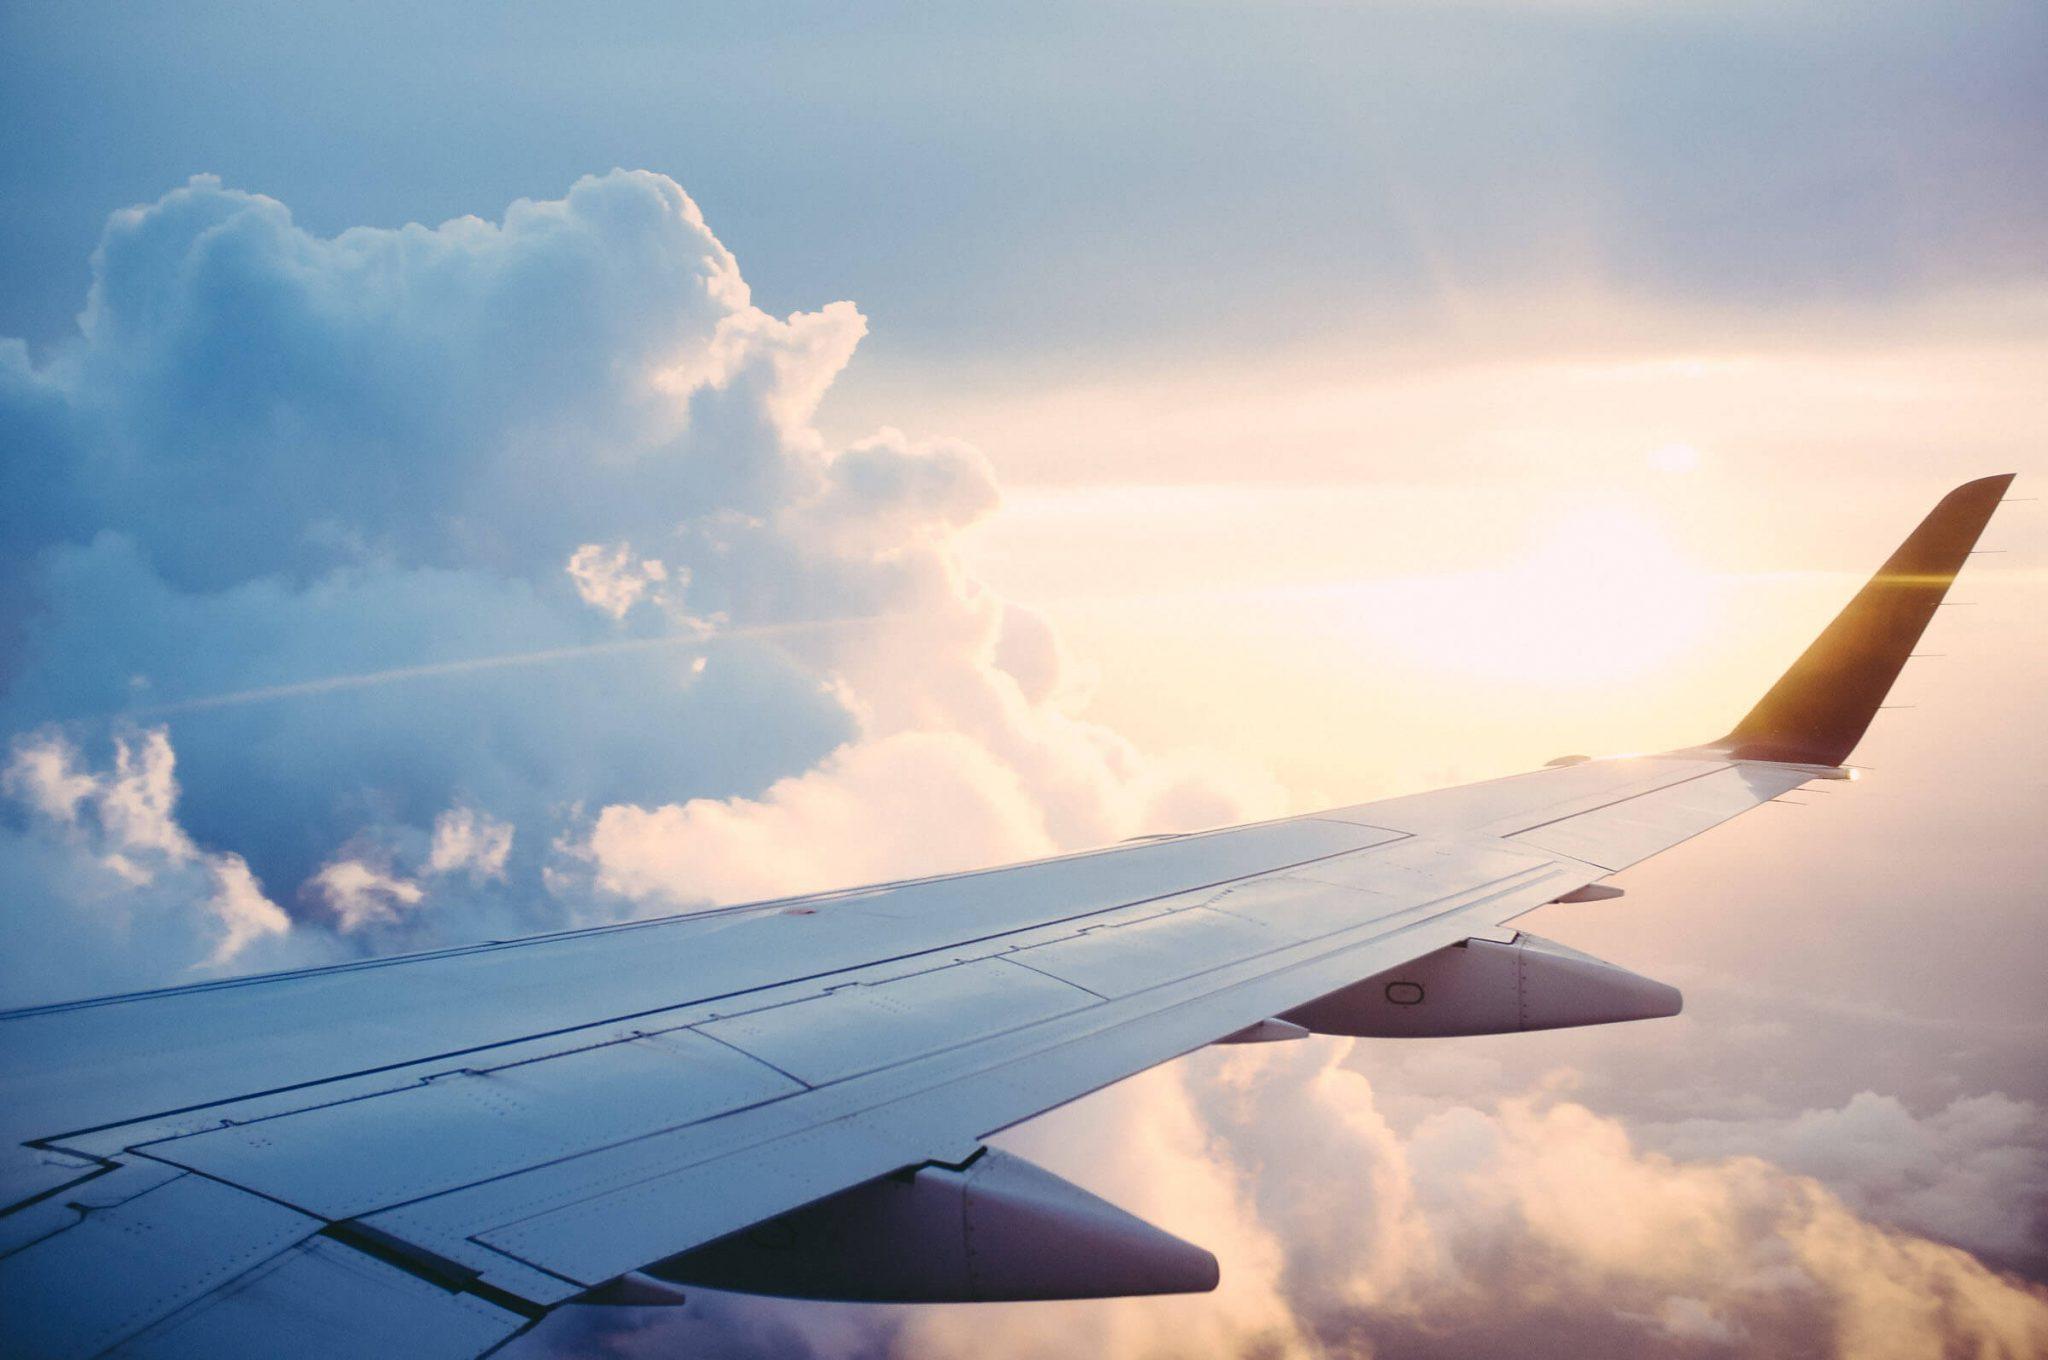 Res till Stockholm med flyg